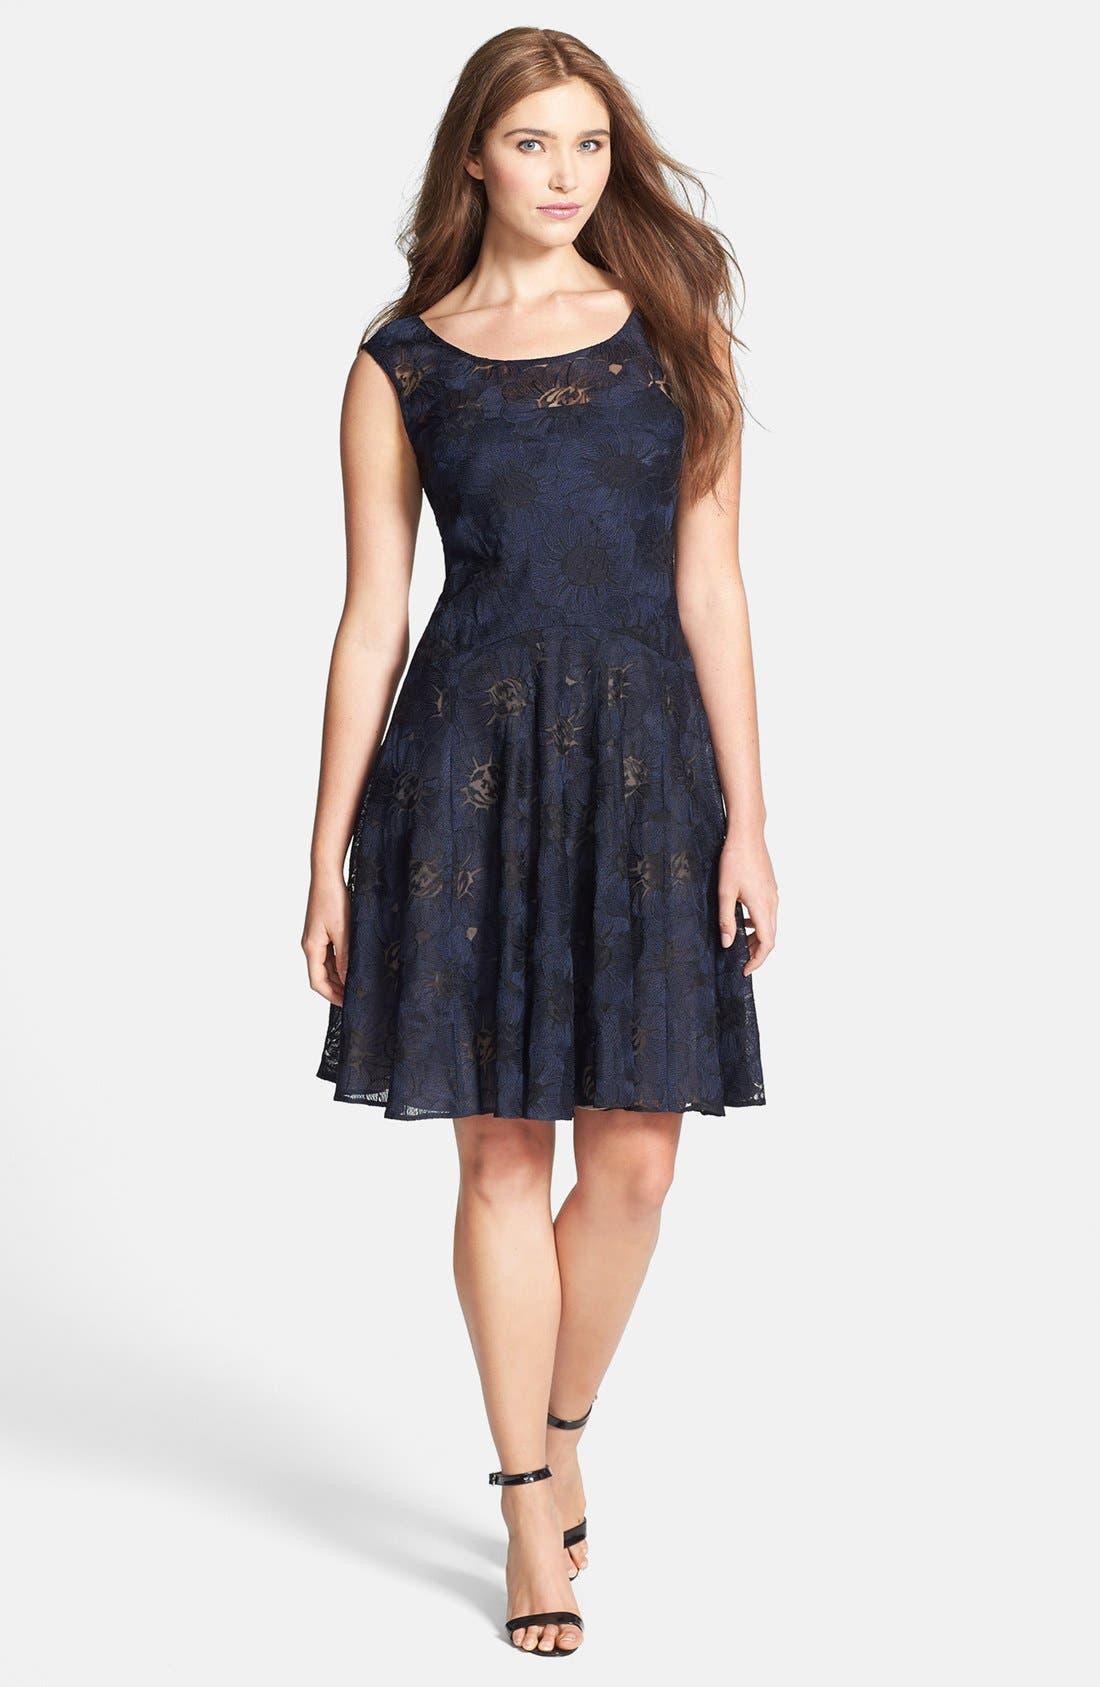 Main Image - Vera Wang Illusion Lined Lace Fit & Flare Dress